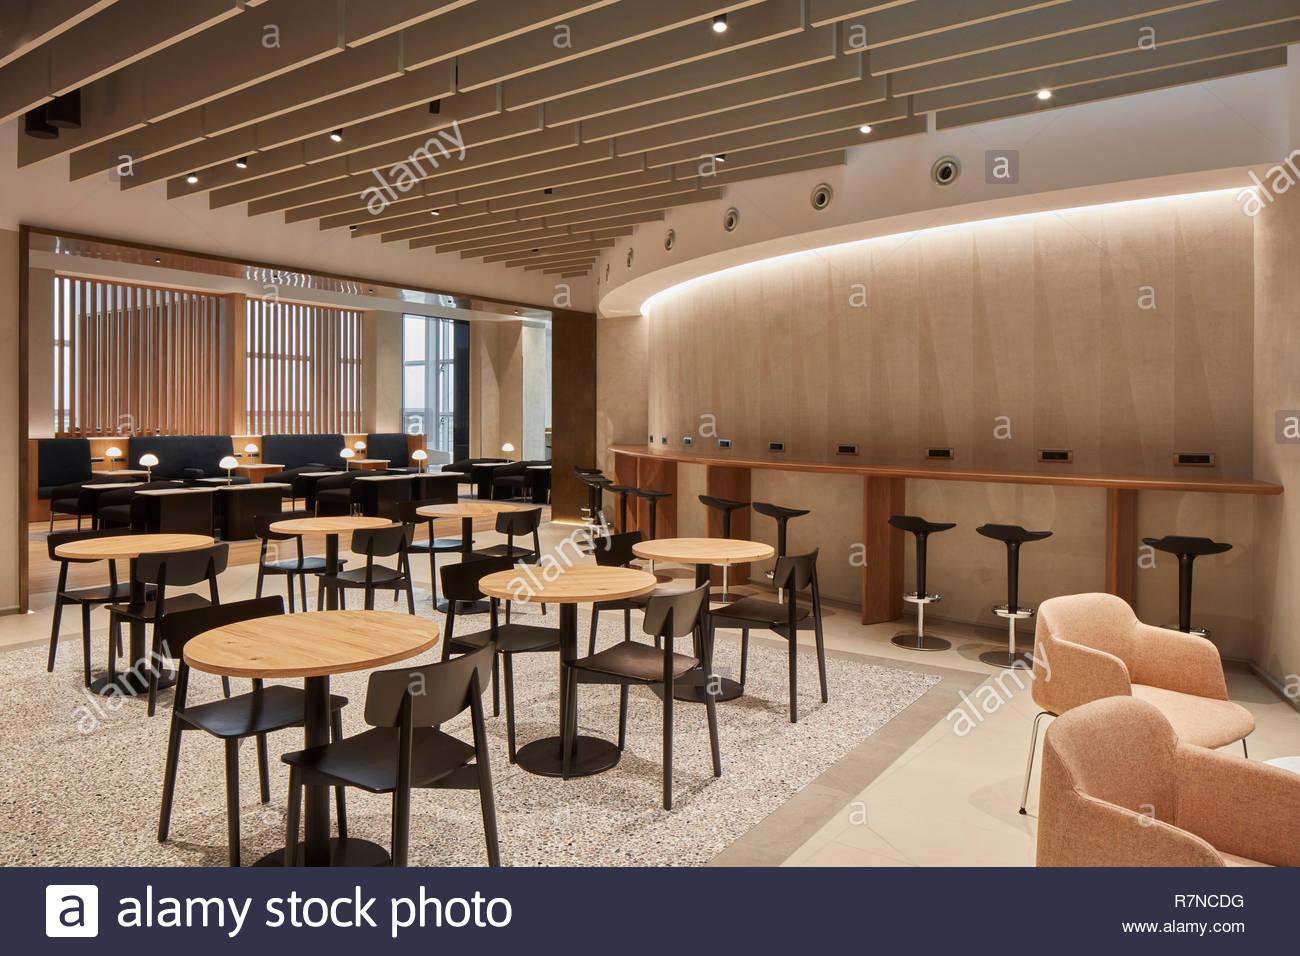 Seating at British Airways Executive Lounge Rome. British Airways Executive Lounge Rome, Fiumicino, Italy. Architect: Universal Design Studio, 2018. - Stock Image